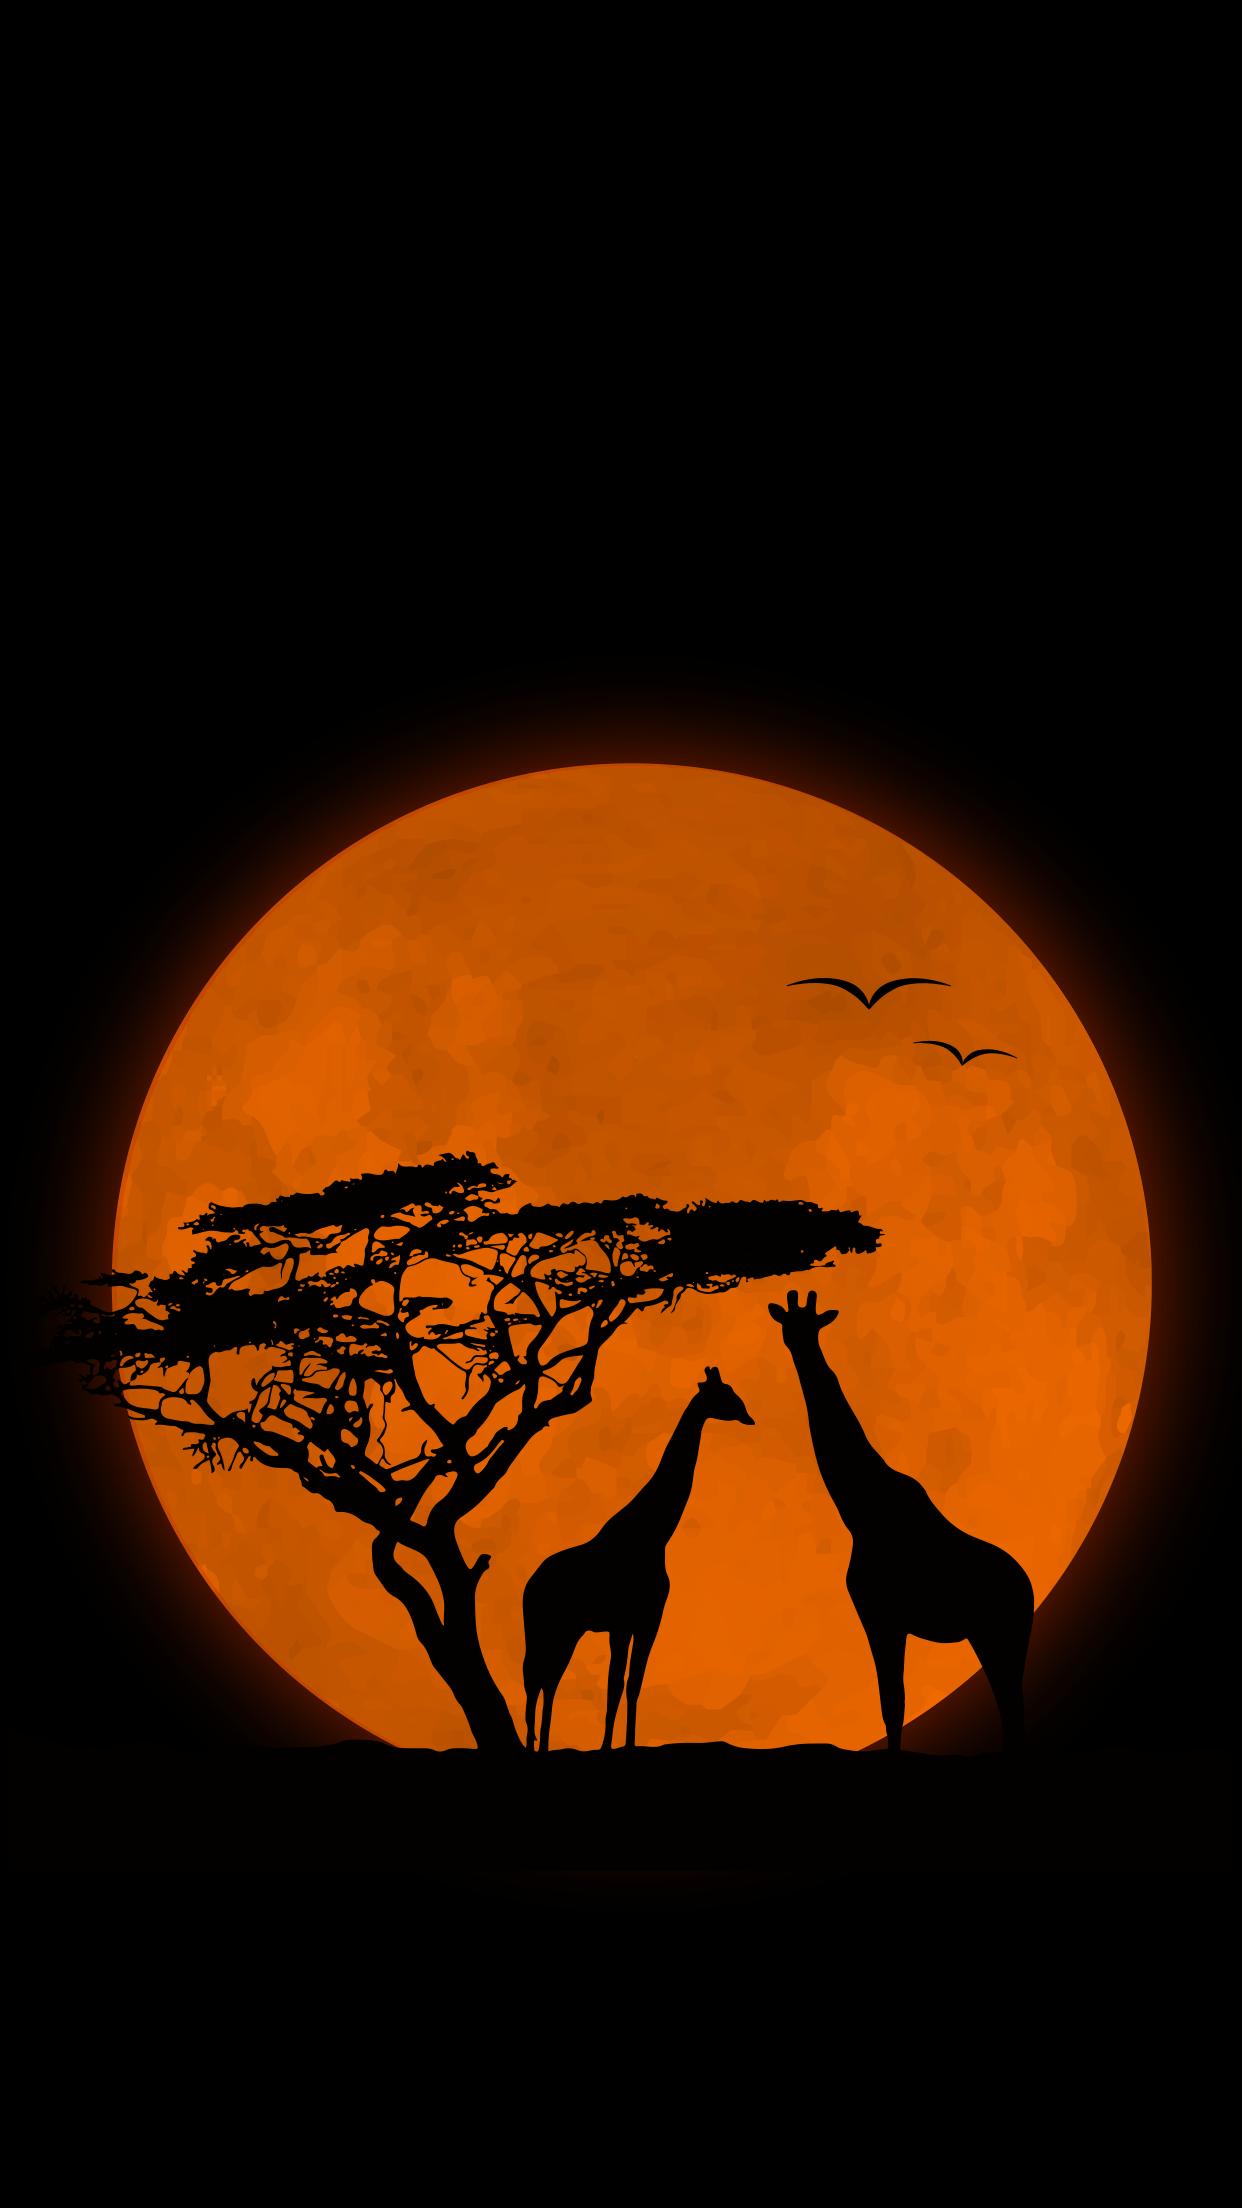 Giraffe Iphone6 In 2019 Wallpaper Backgrounds Dark